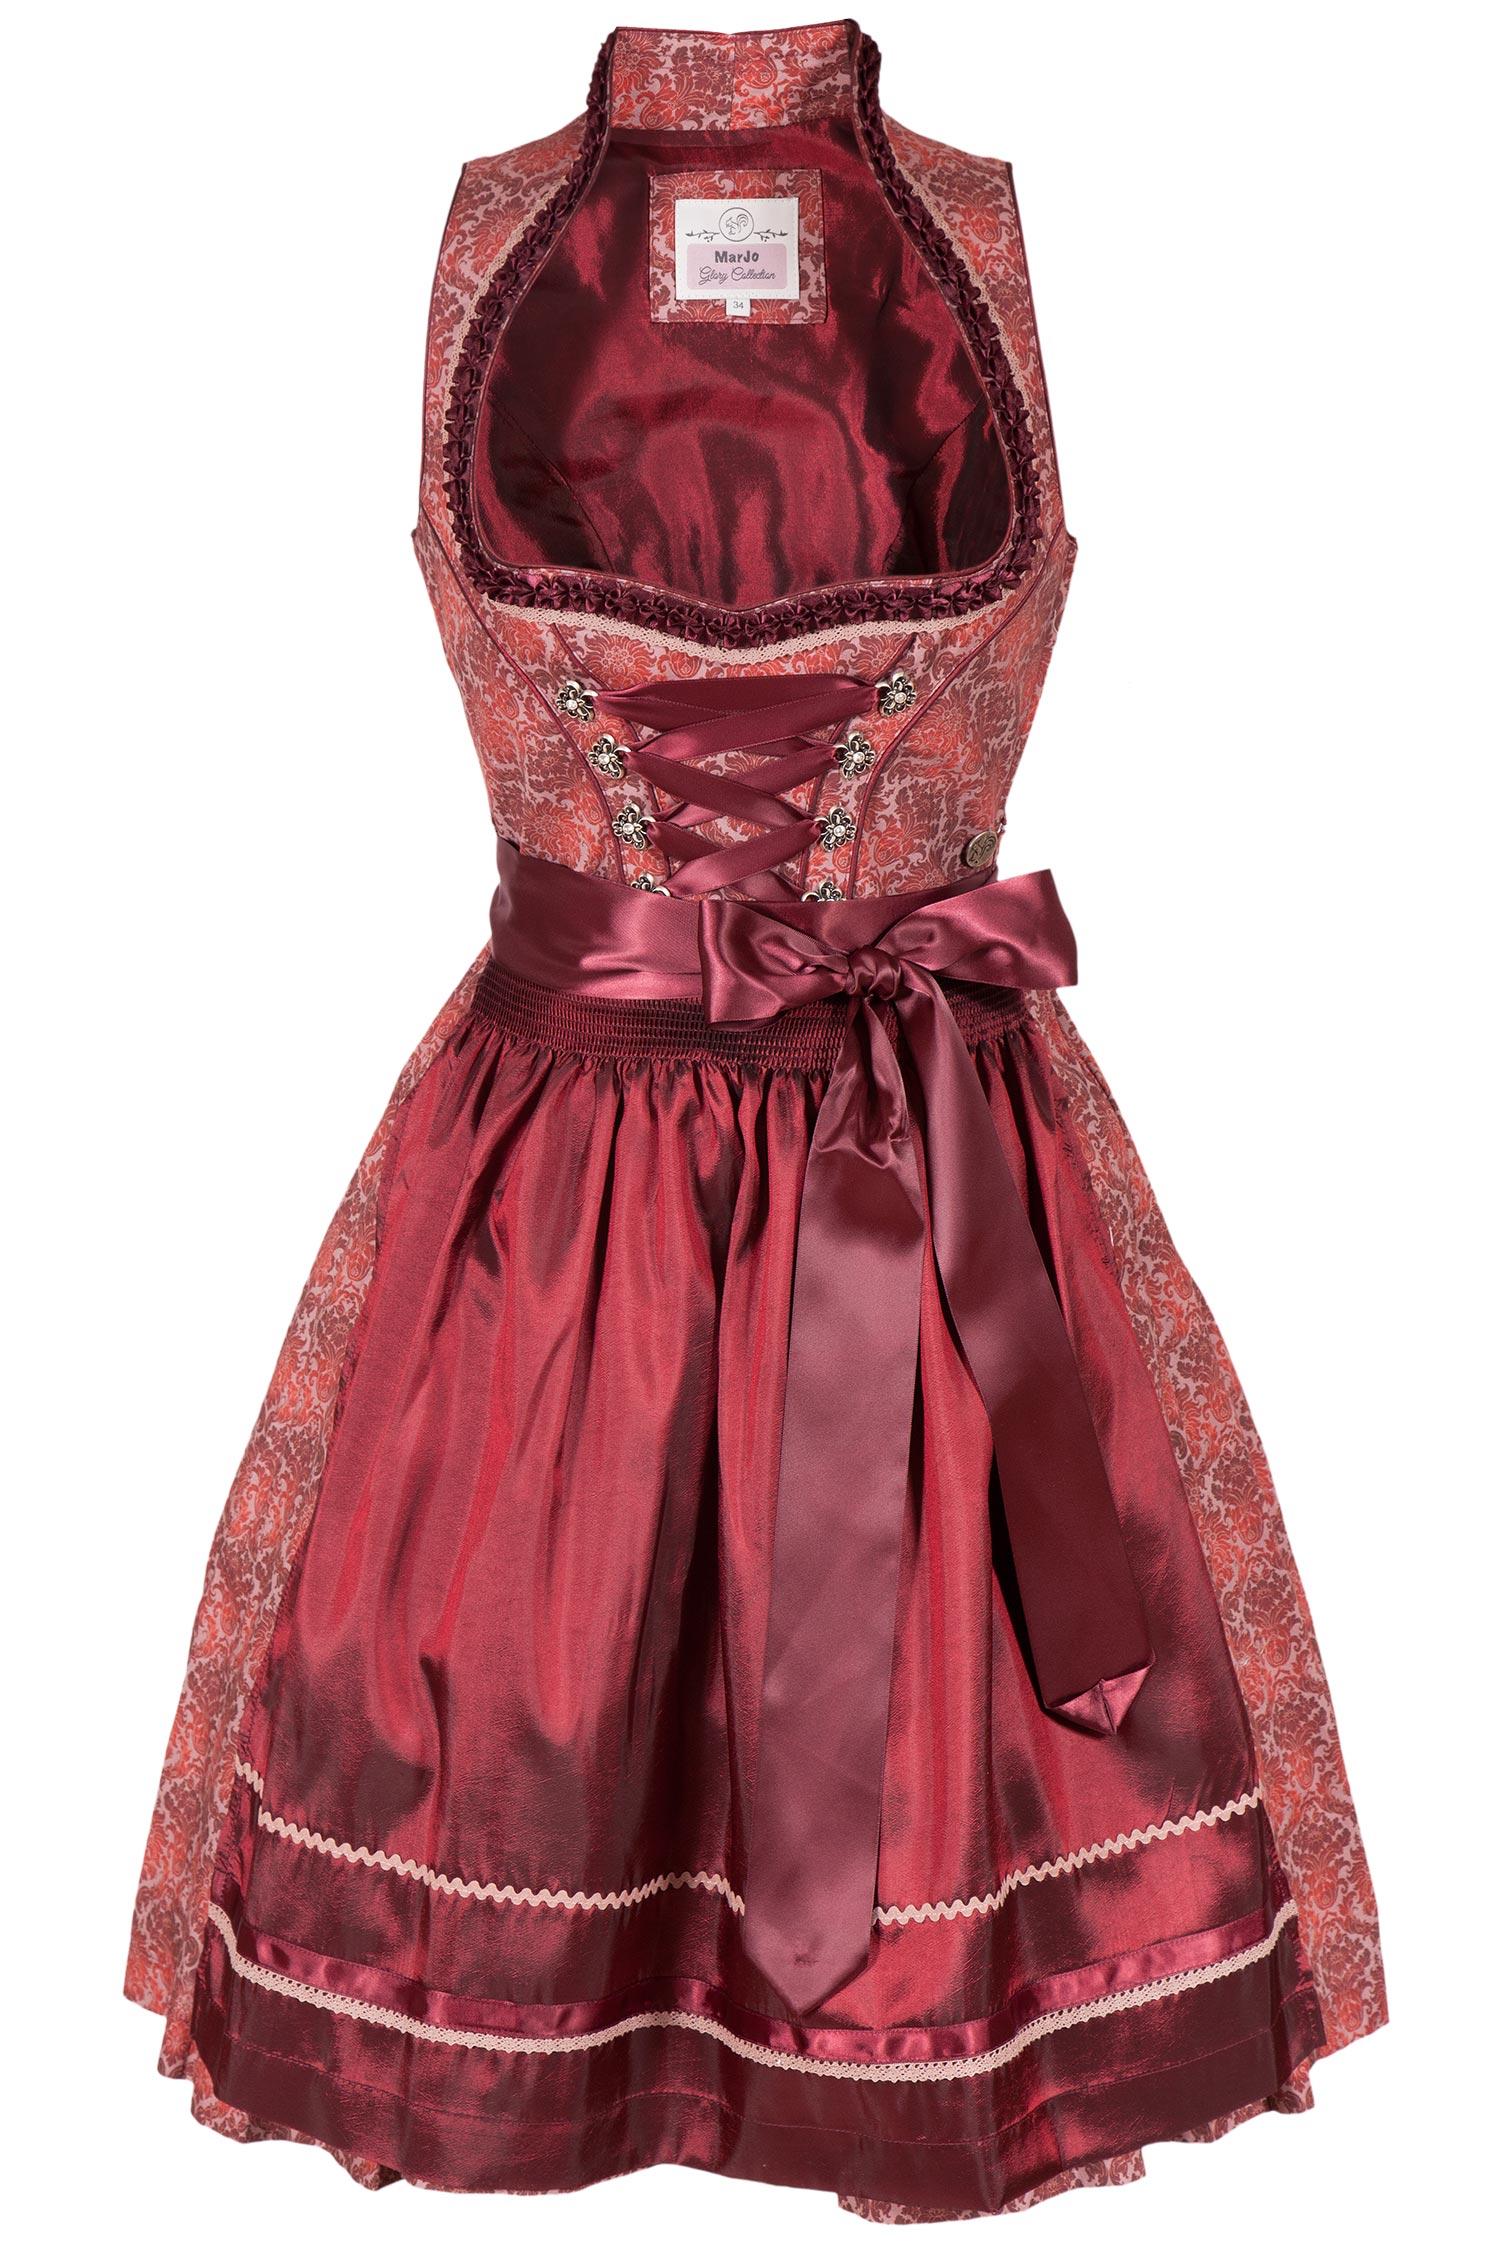 Marjo Damen Mini Dirndl Trachten Kleid kurz rosa 48cm Spitzenschürze silber edel